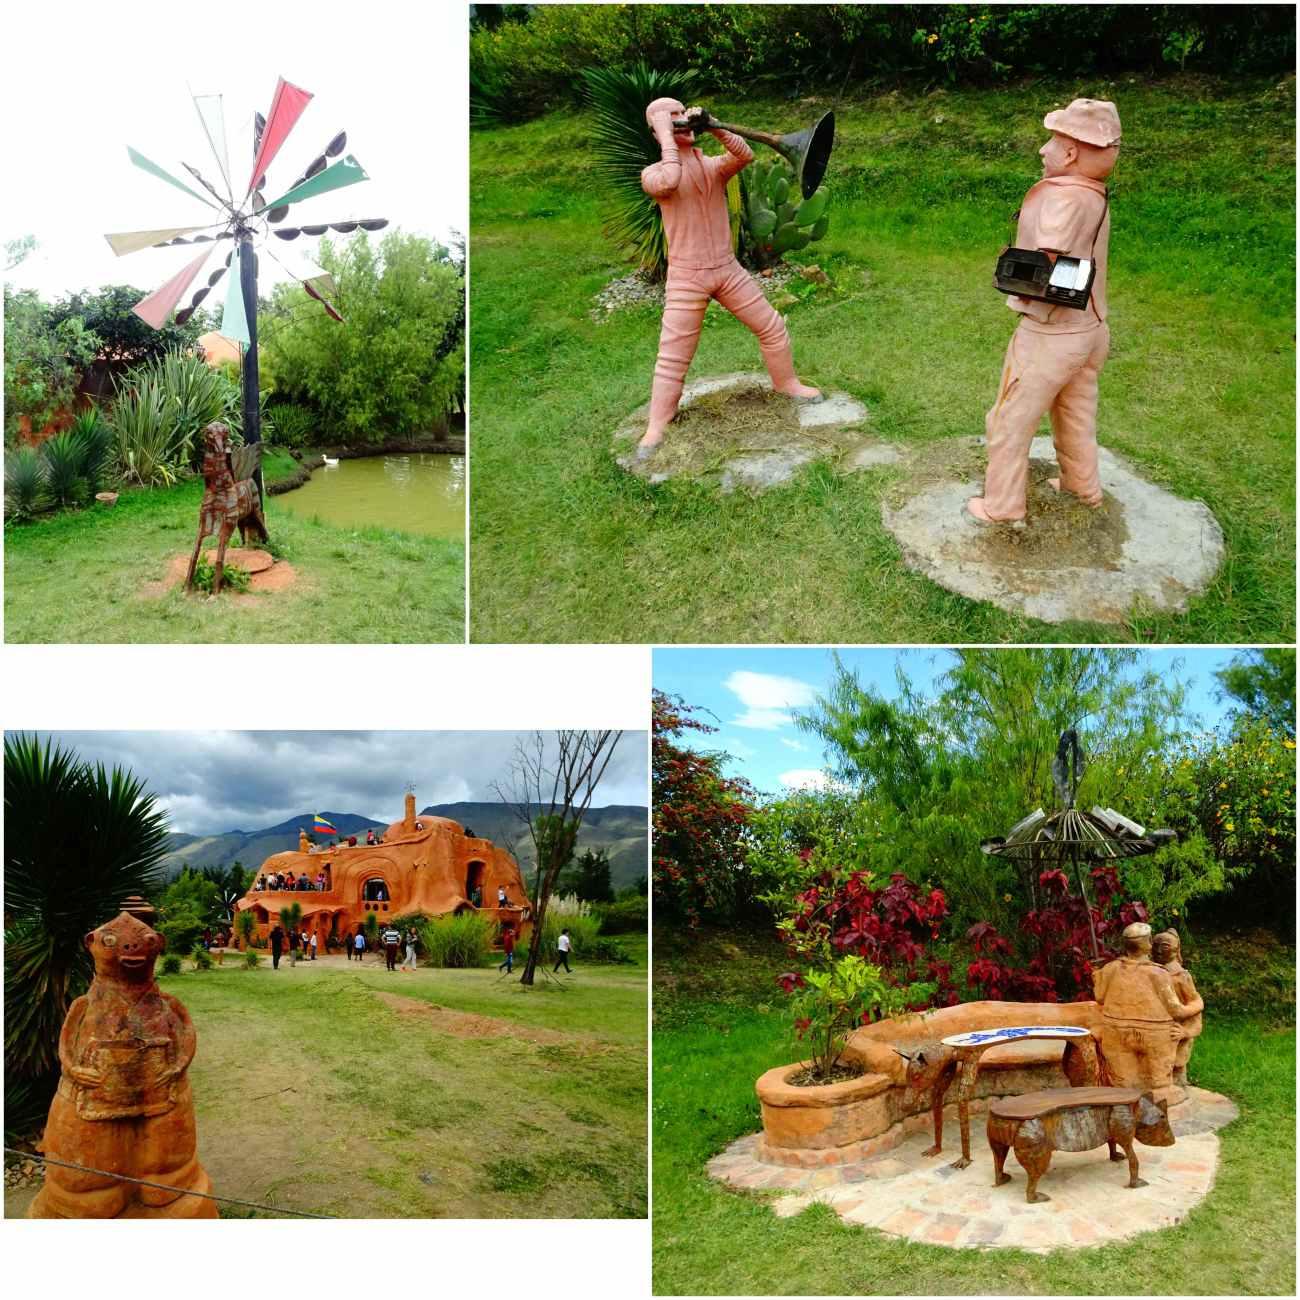 Casa terracotta statues